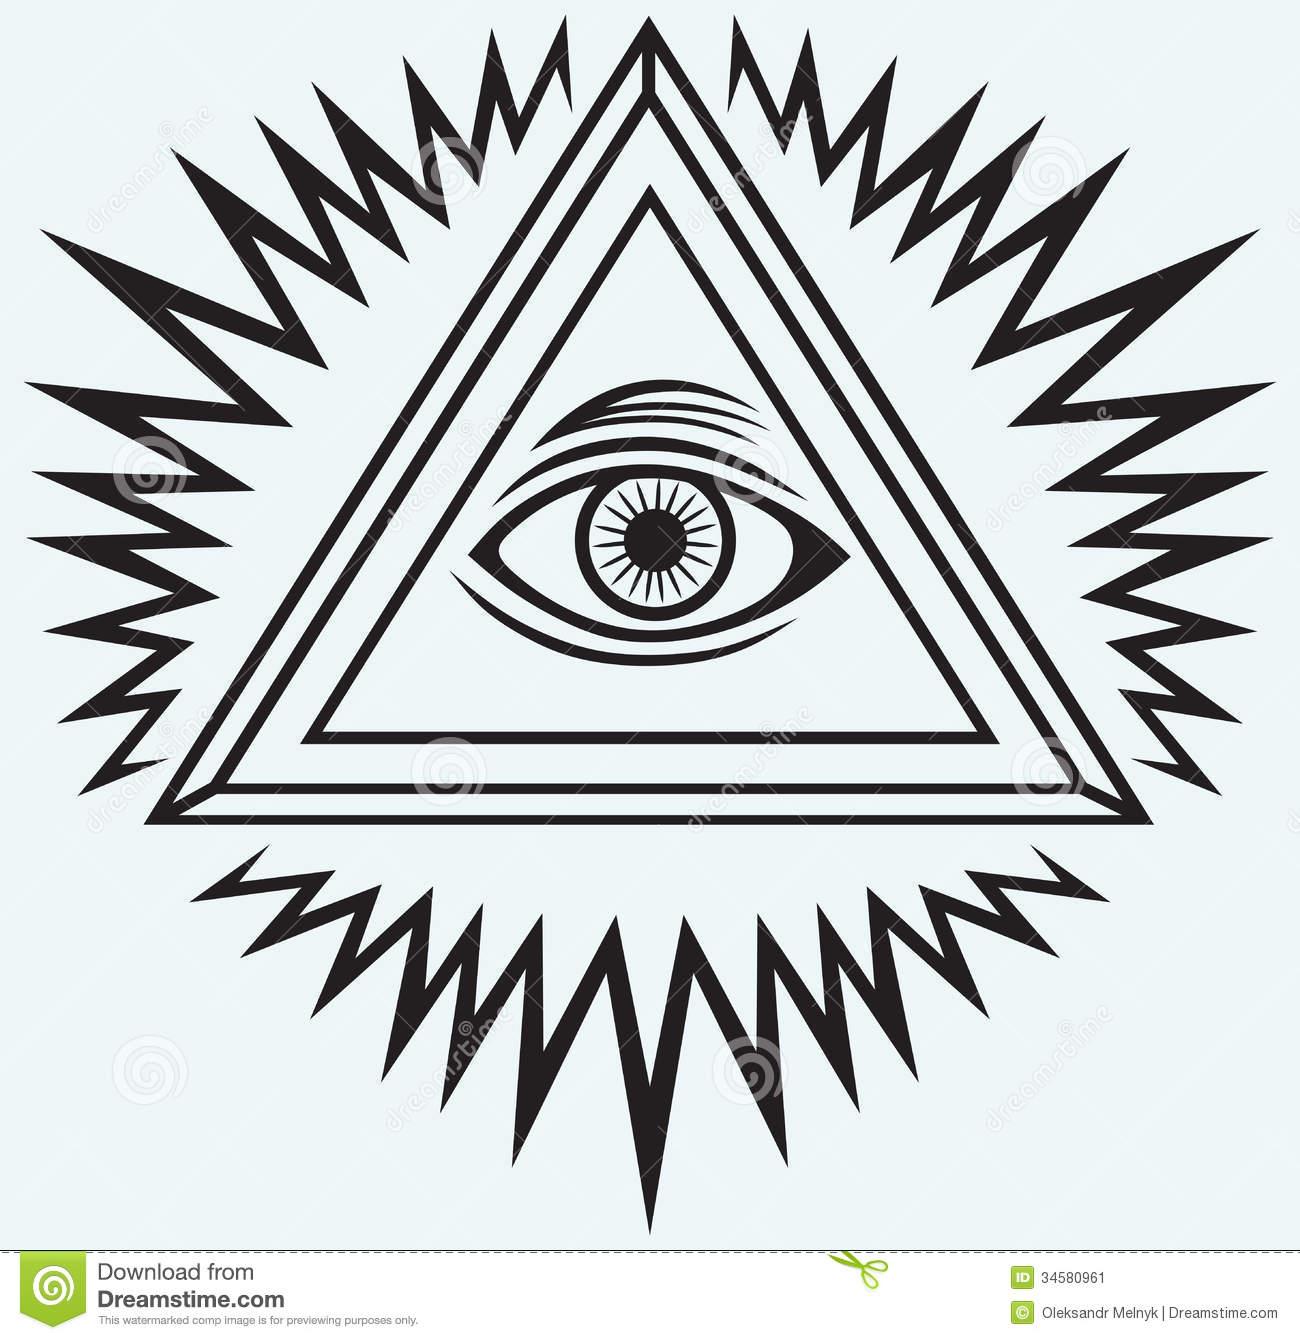 Illuminati clipart #14, Download drawings